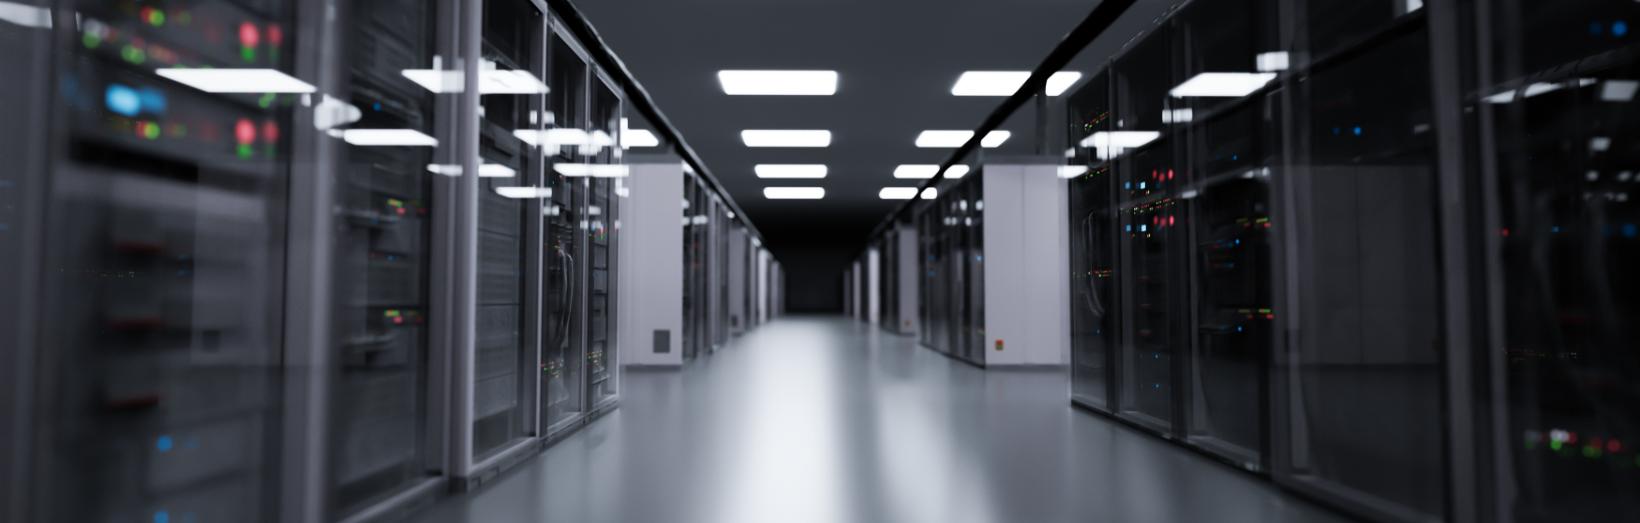 server-room-modern-data-center-RNX36L4.png